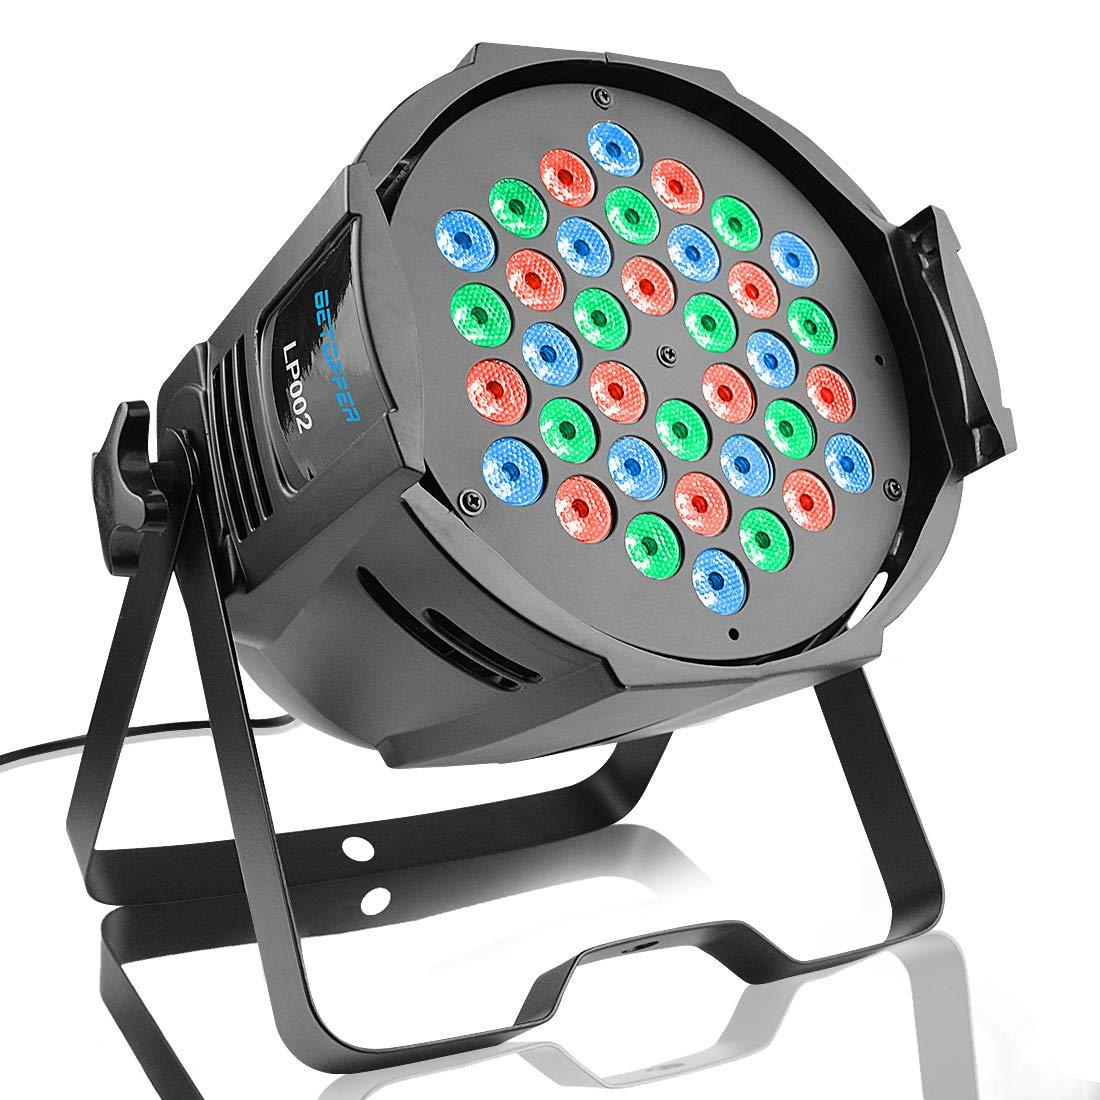 3 RGBW LED Luces dj Luces discoteca led Luces escenario BETOPPER Luces dmx Karaoke profesional Iluminacion dj 54 LP001-H